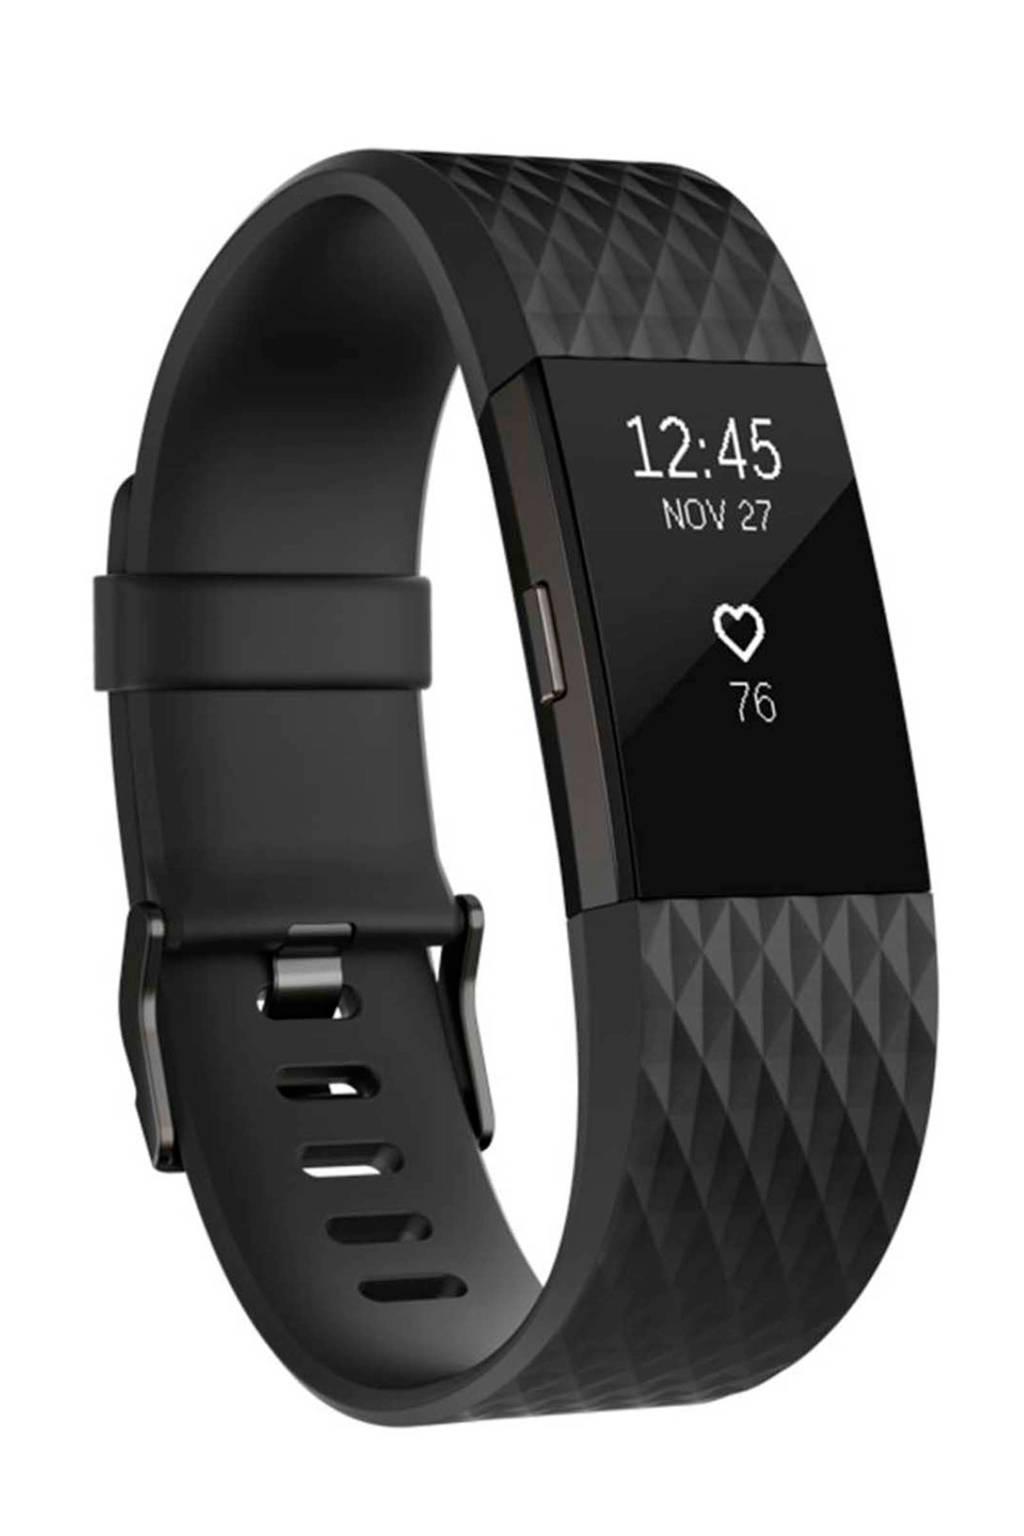 Fitbit activiteiten tracker, -